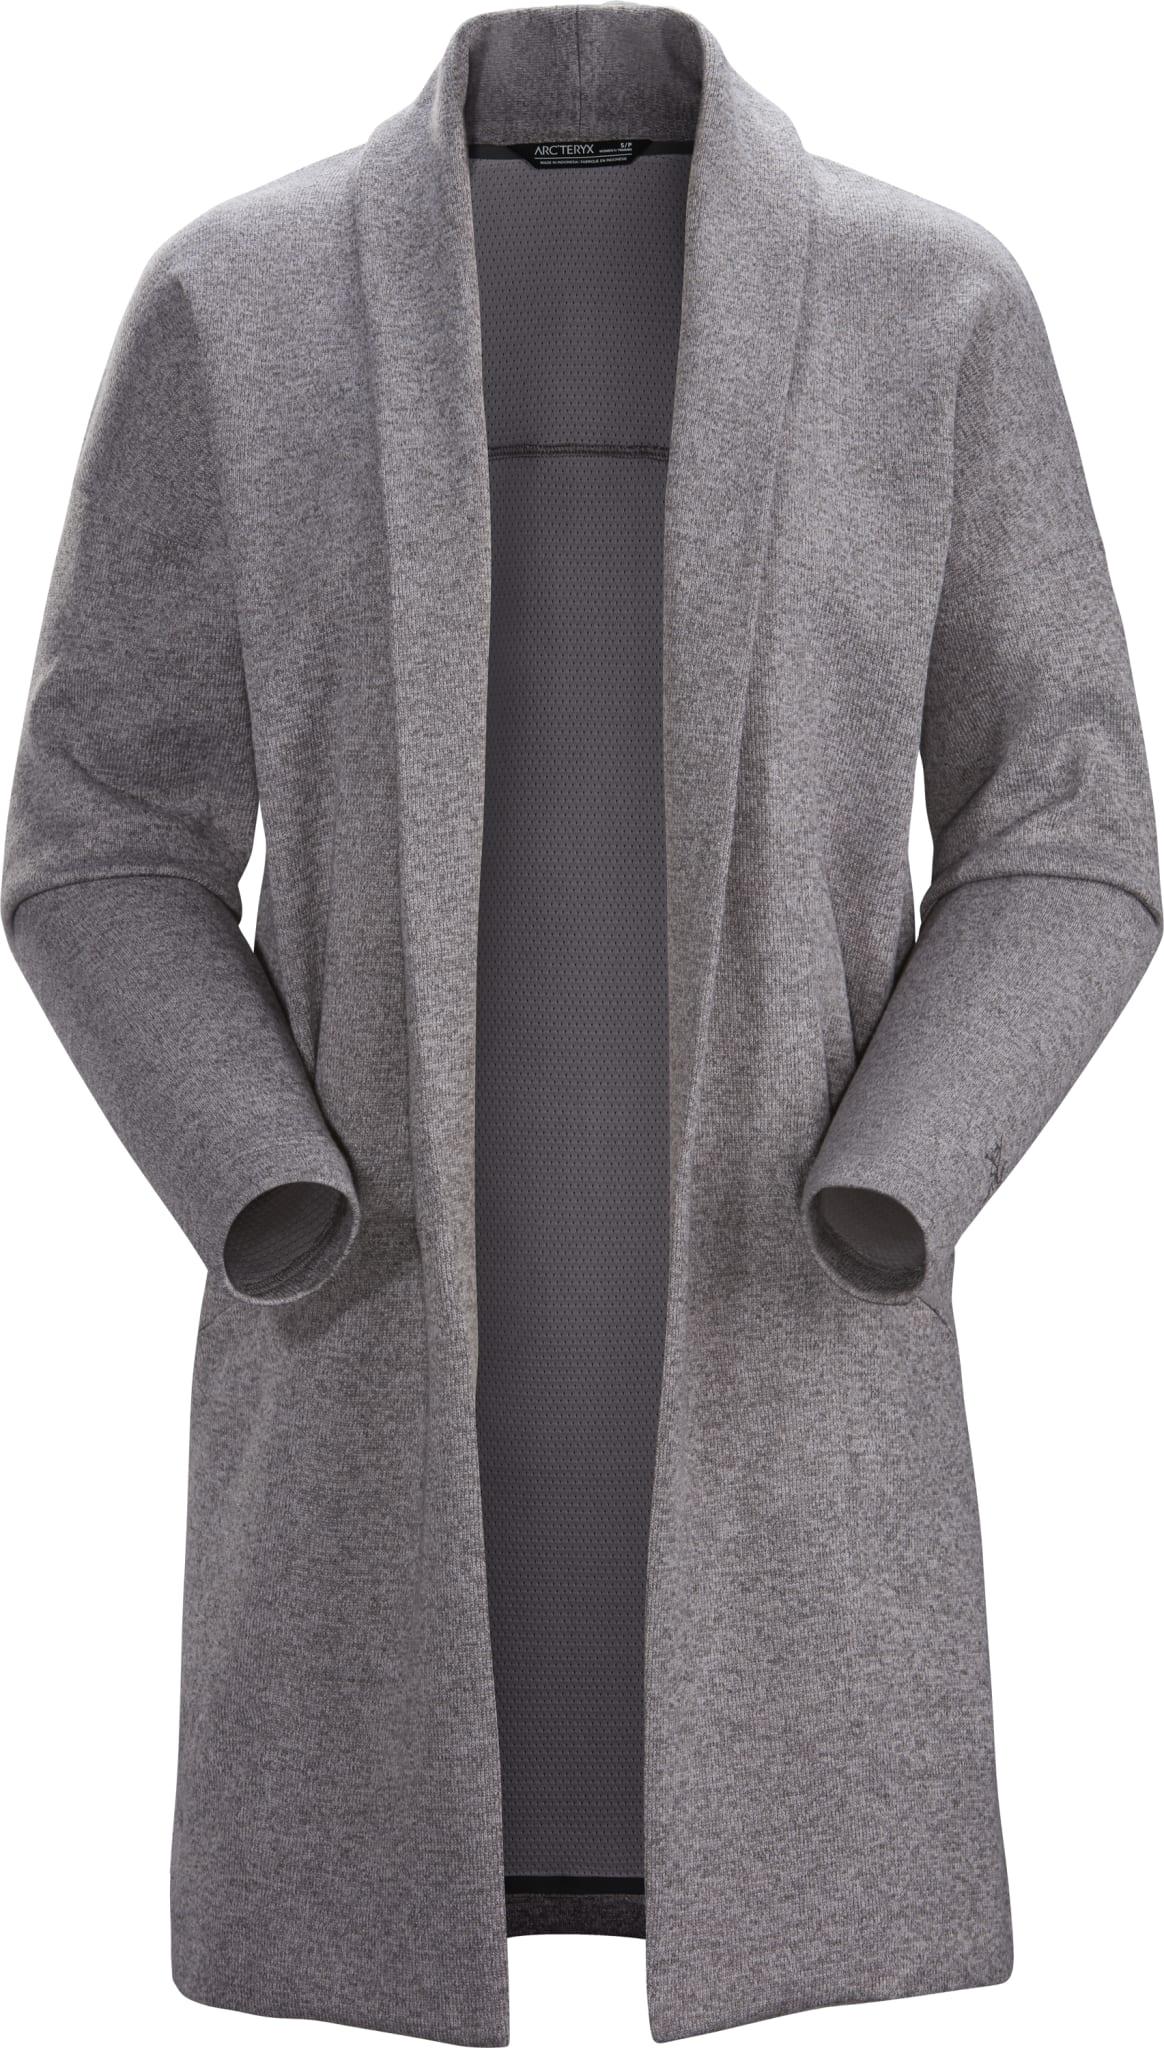 Elegant cardigan i fleece